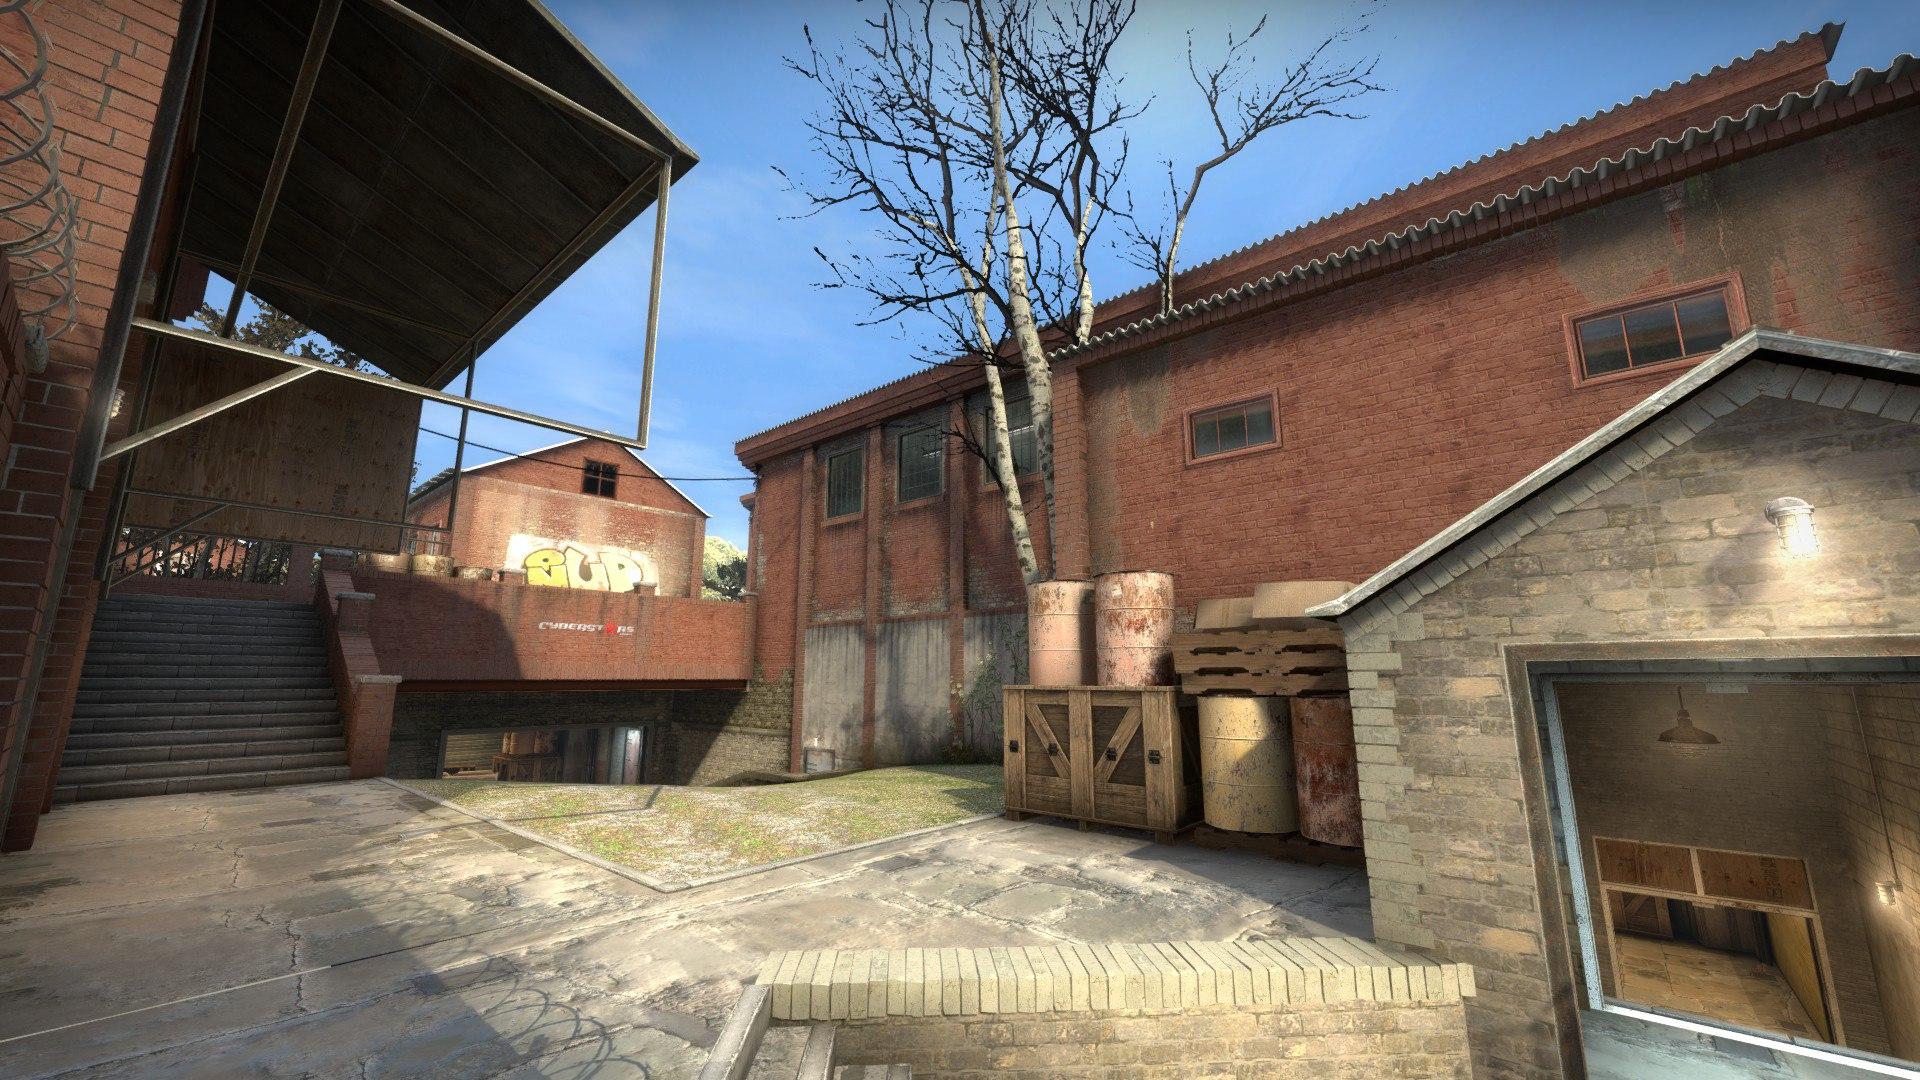 CS:GO] 2 Aim - 3D - Mapcore